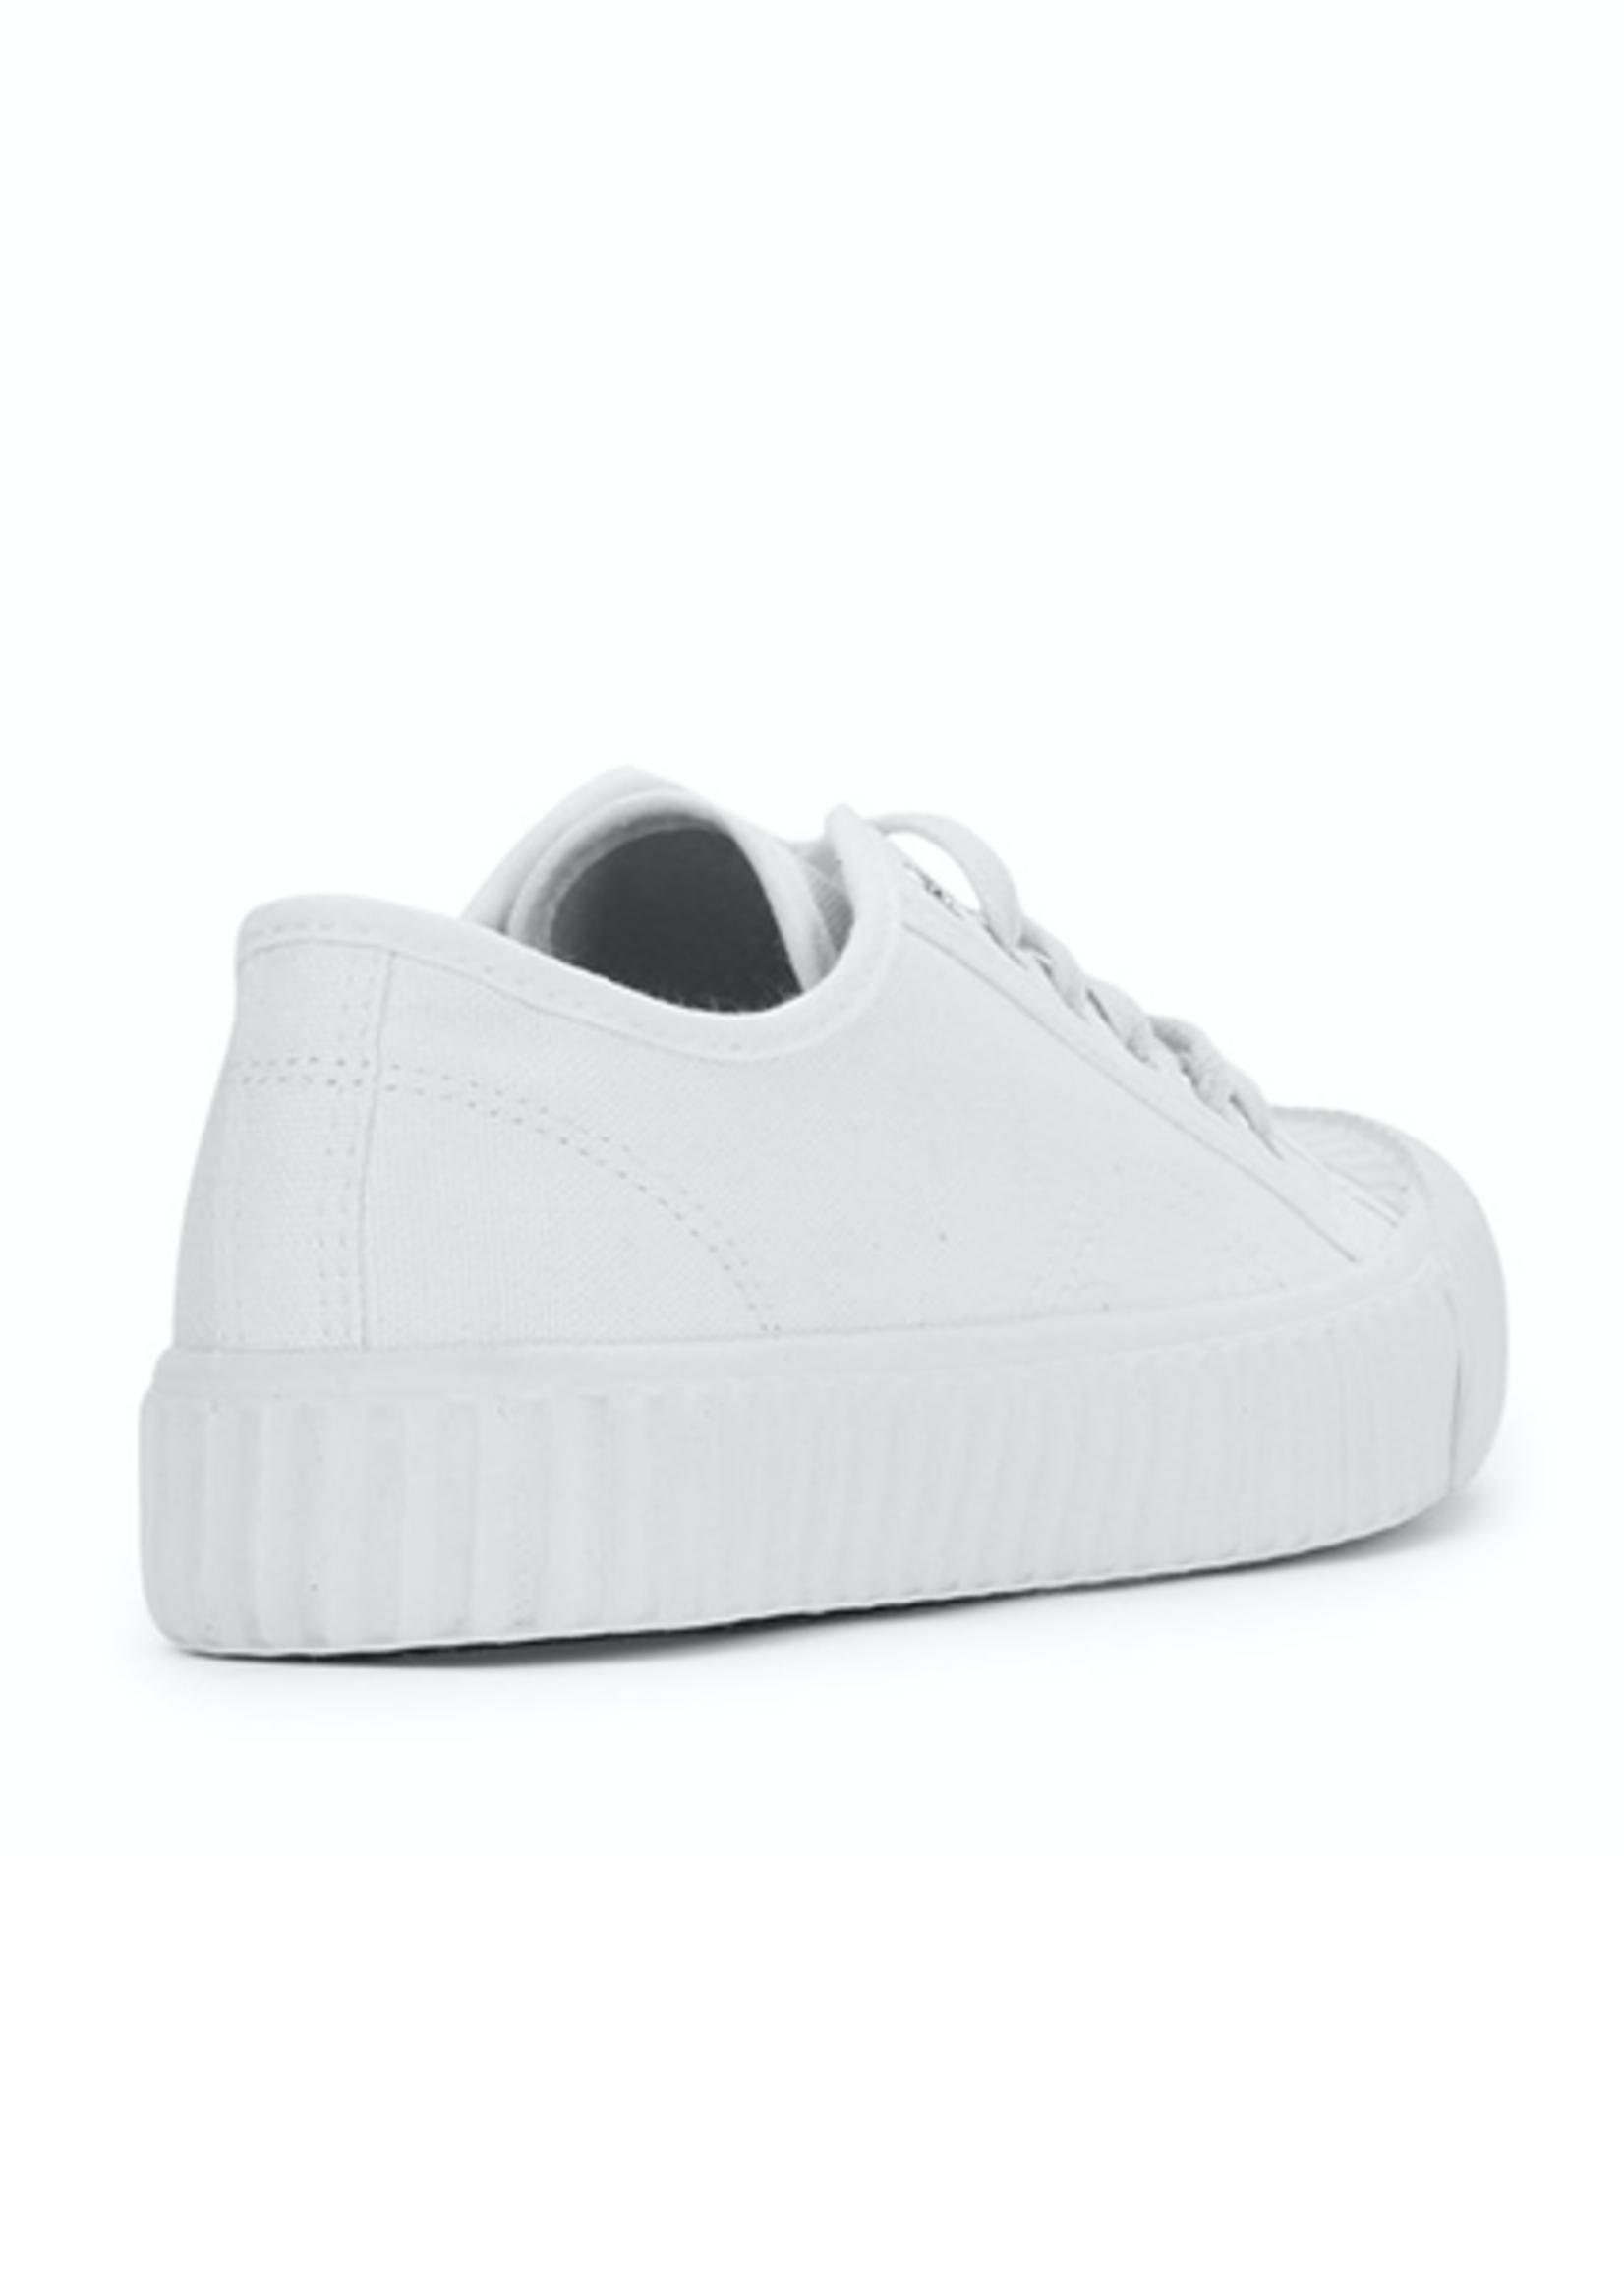 Los Cabos Shena in White